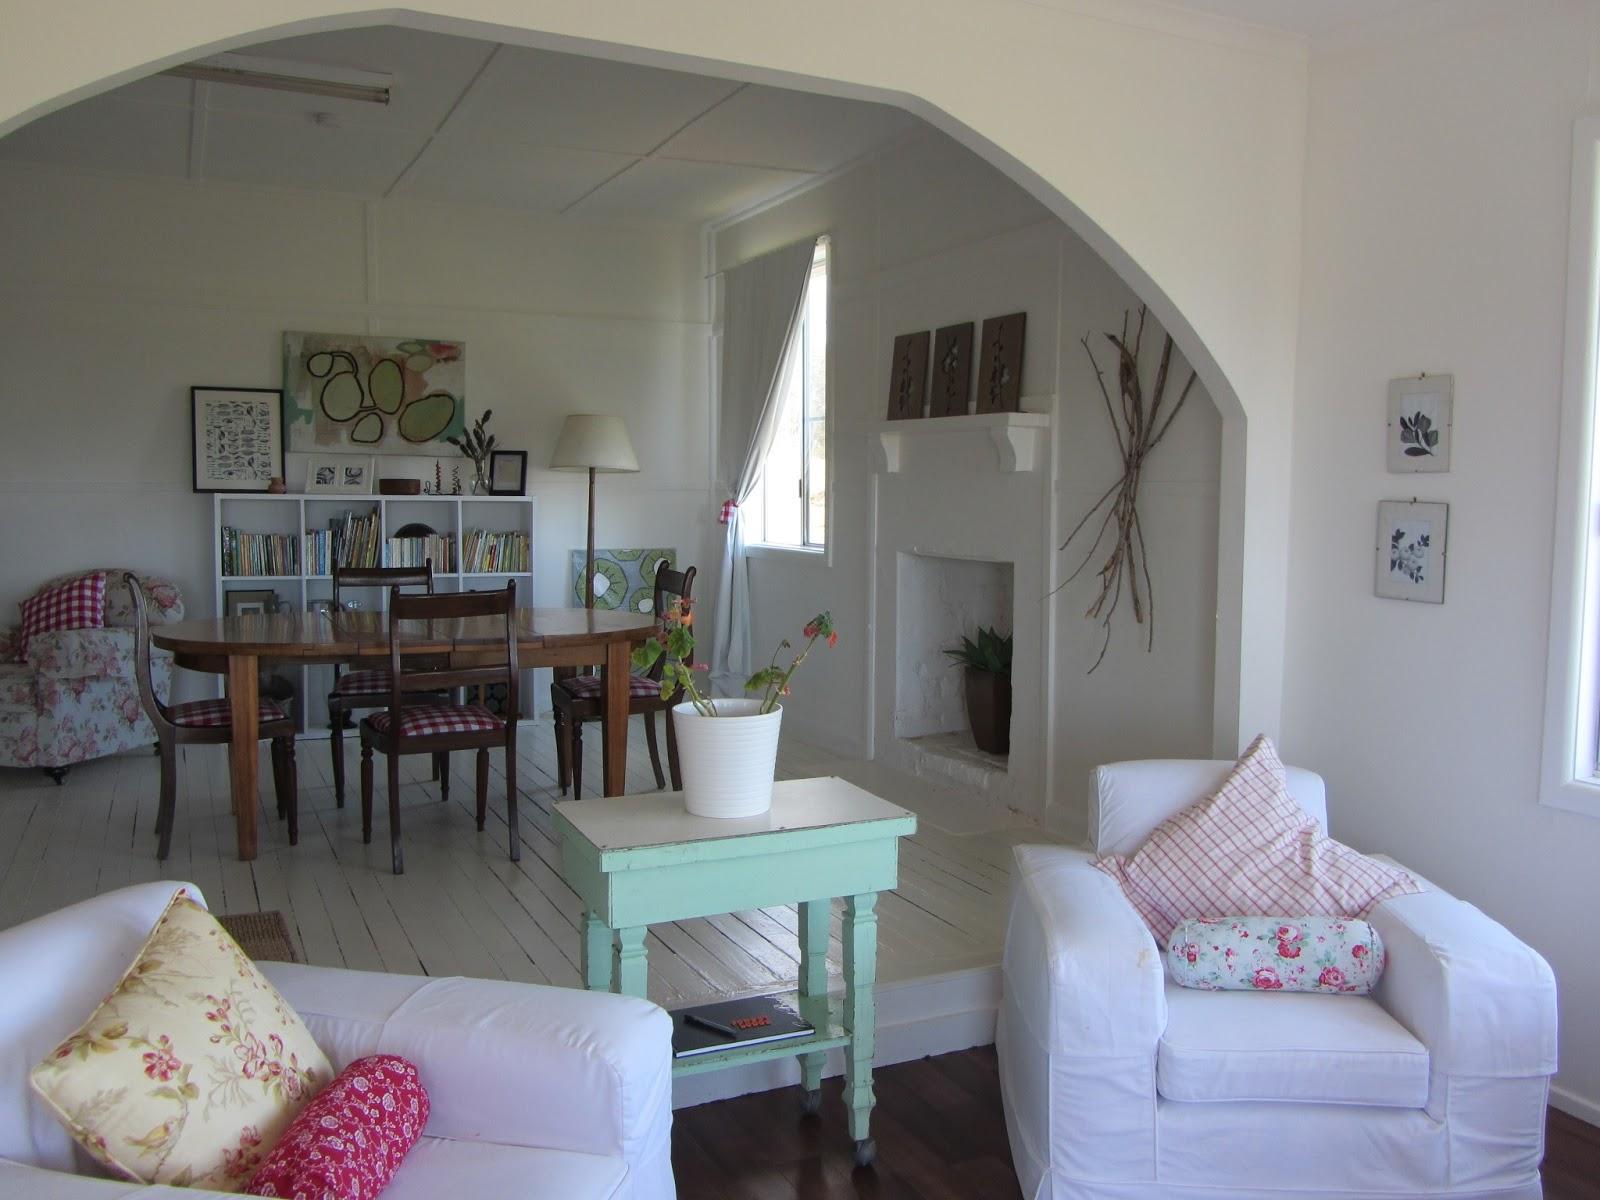 Thom Haus Handmade: A Budget Living Room Renovation